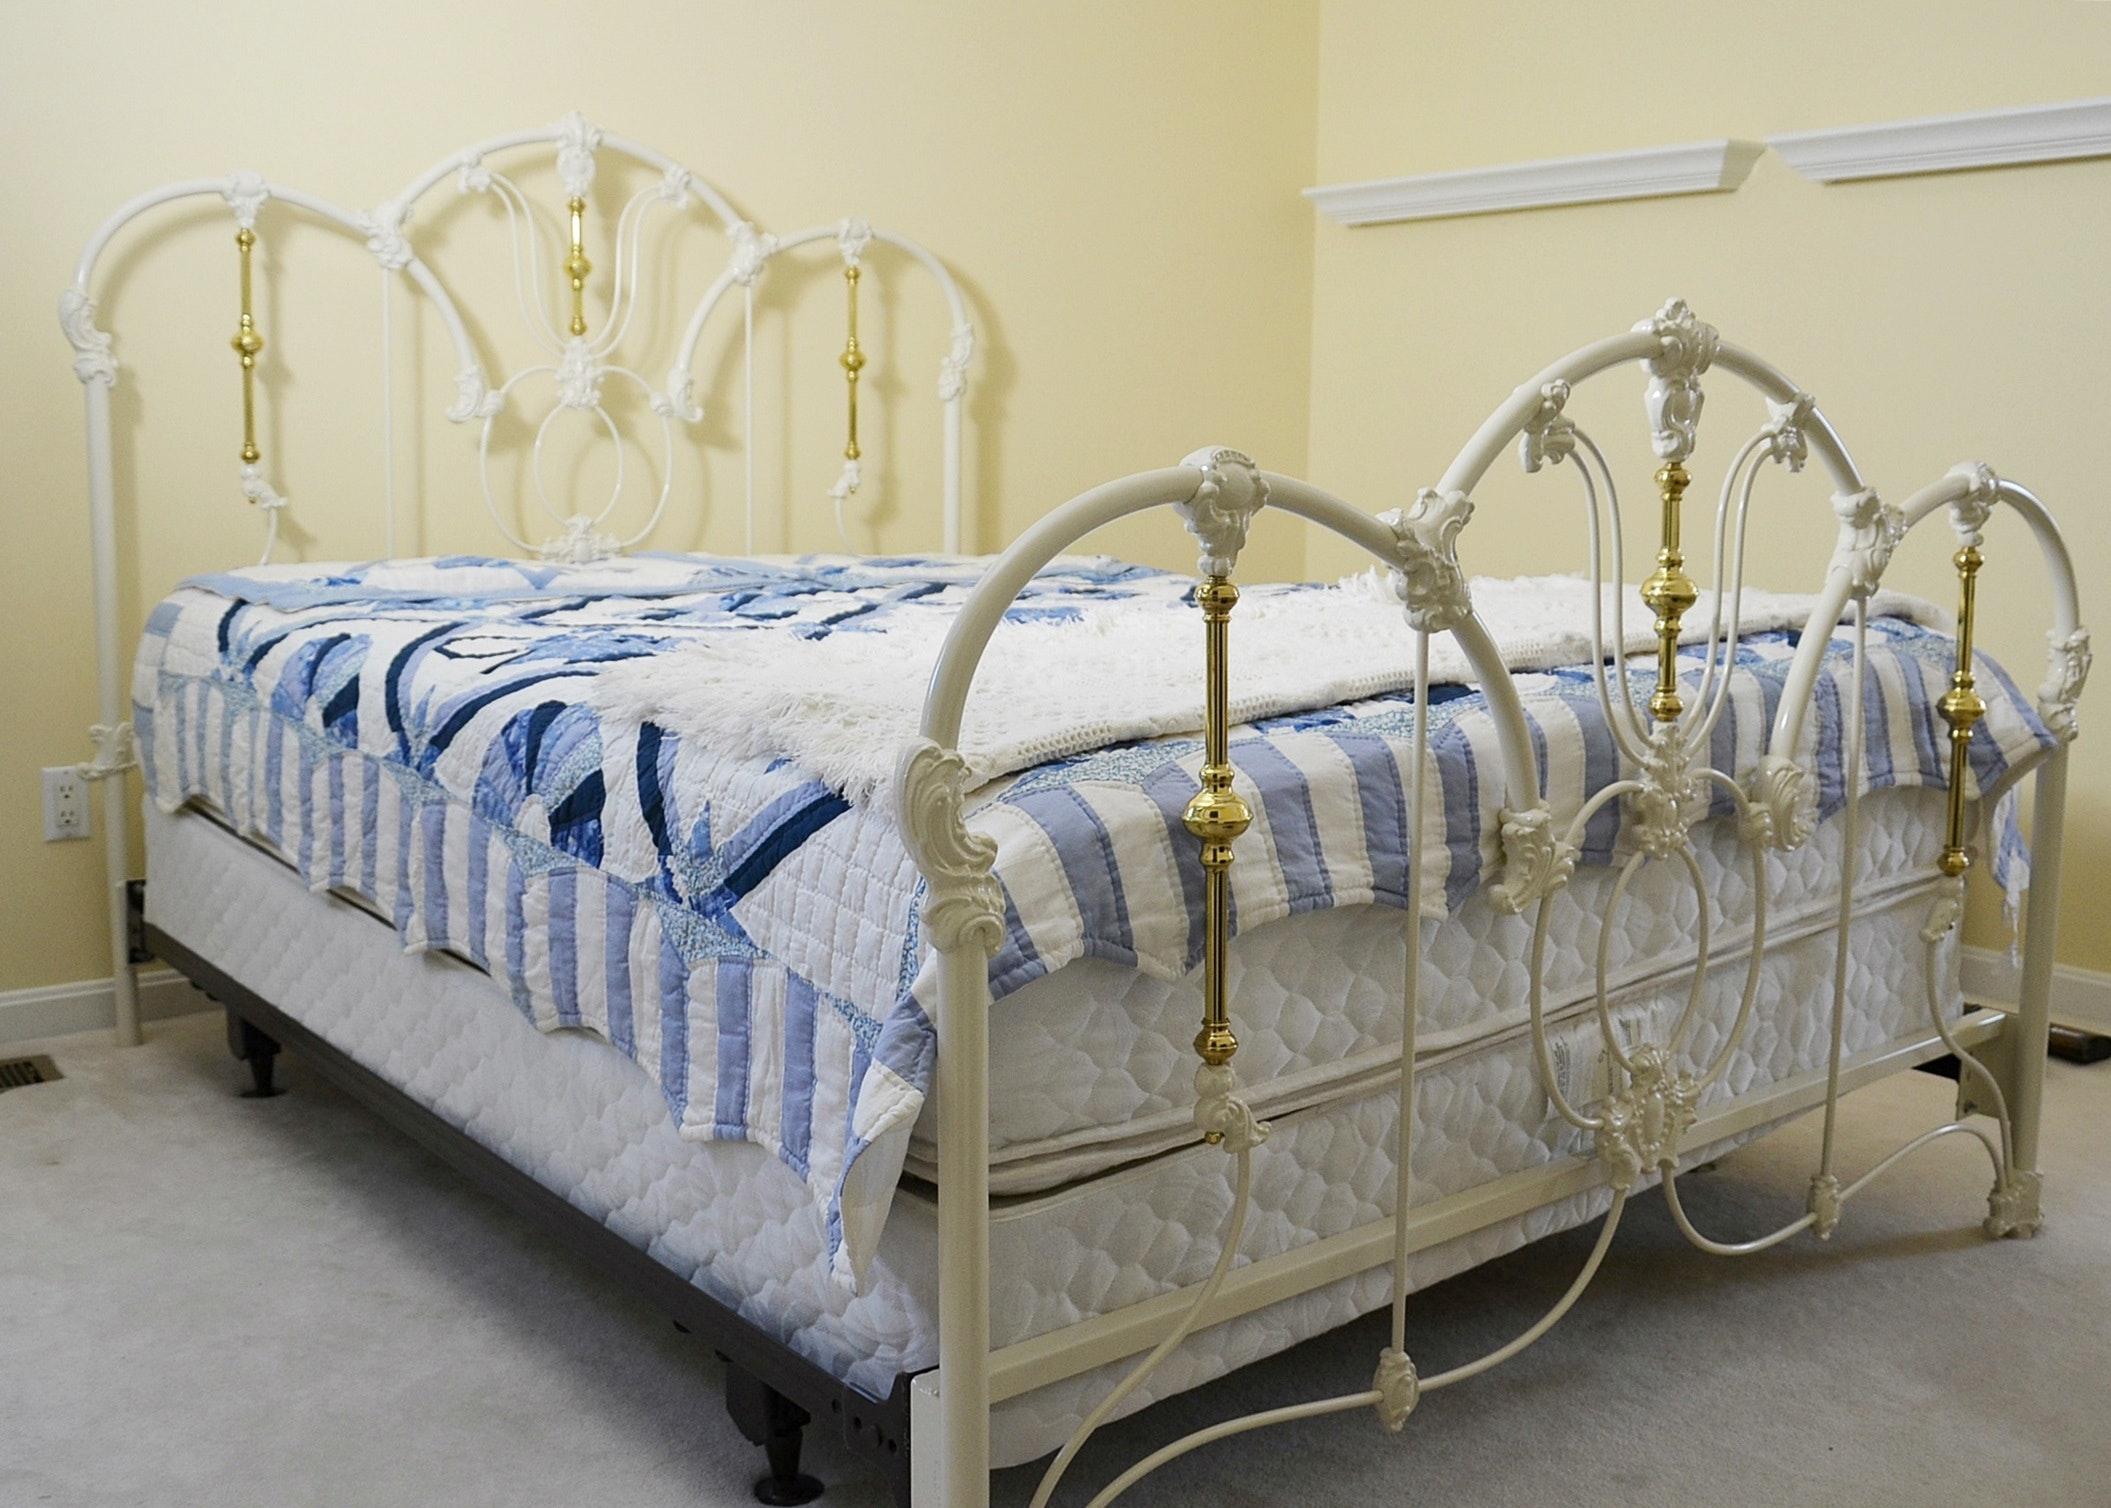 Elliot S Designs Jasmine White Metal Queen Bed With